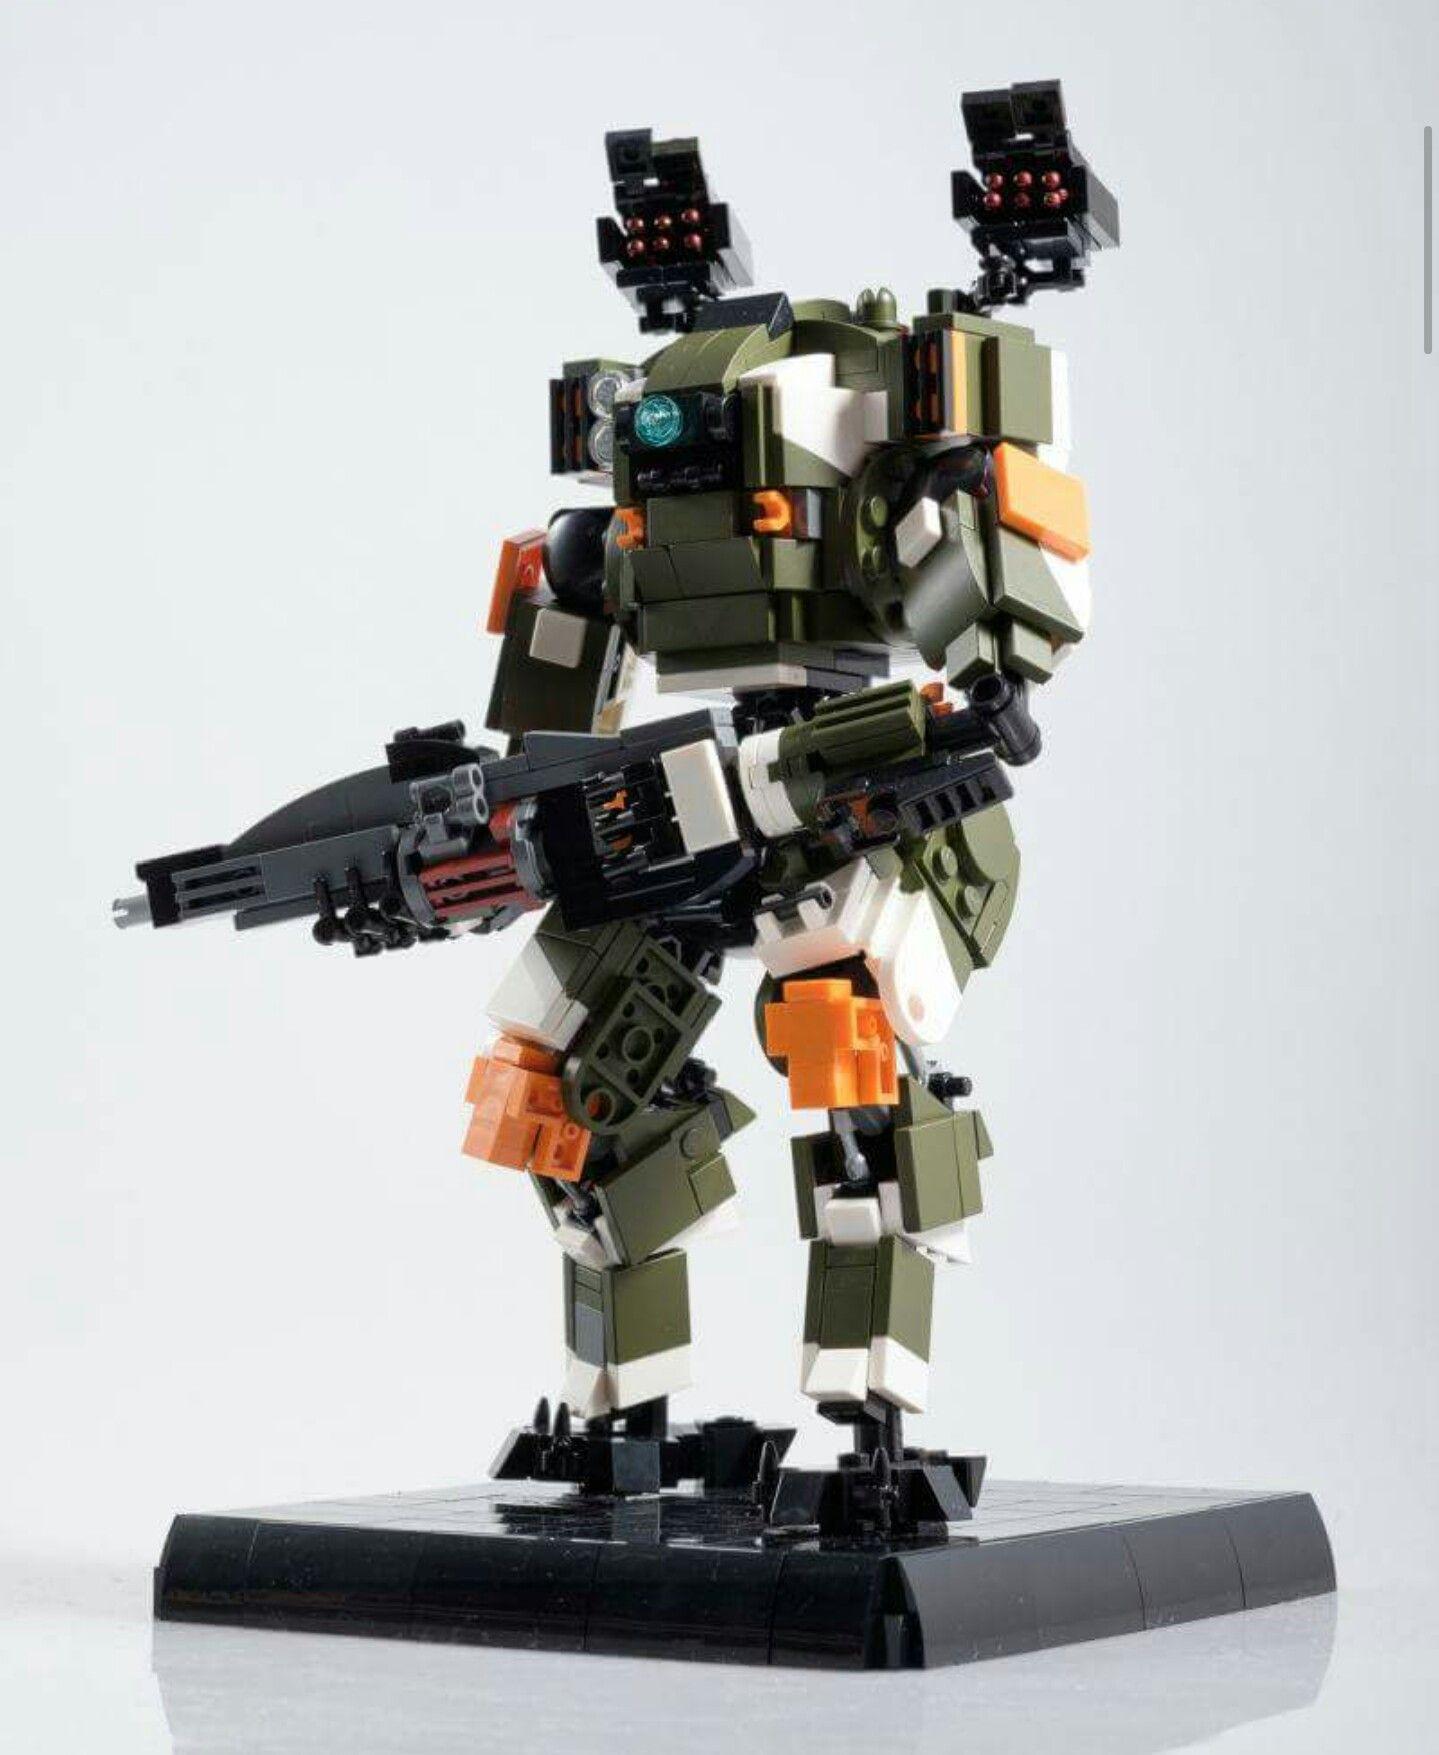 omg, tone titan from titanfall2